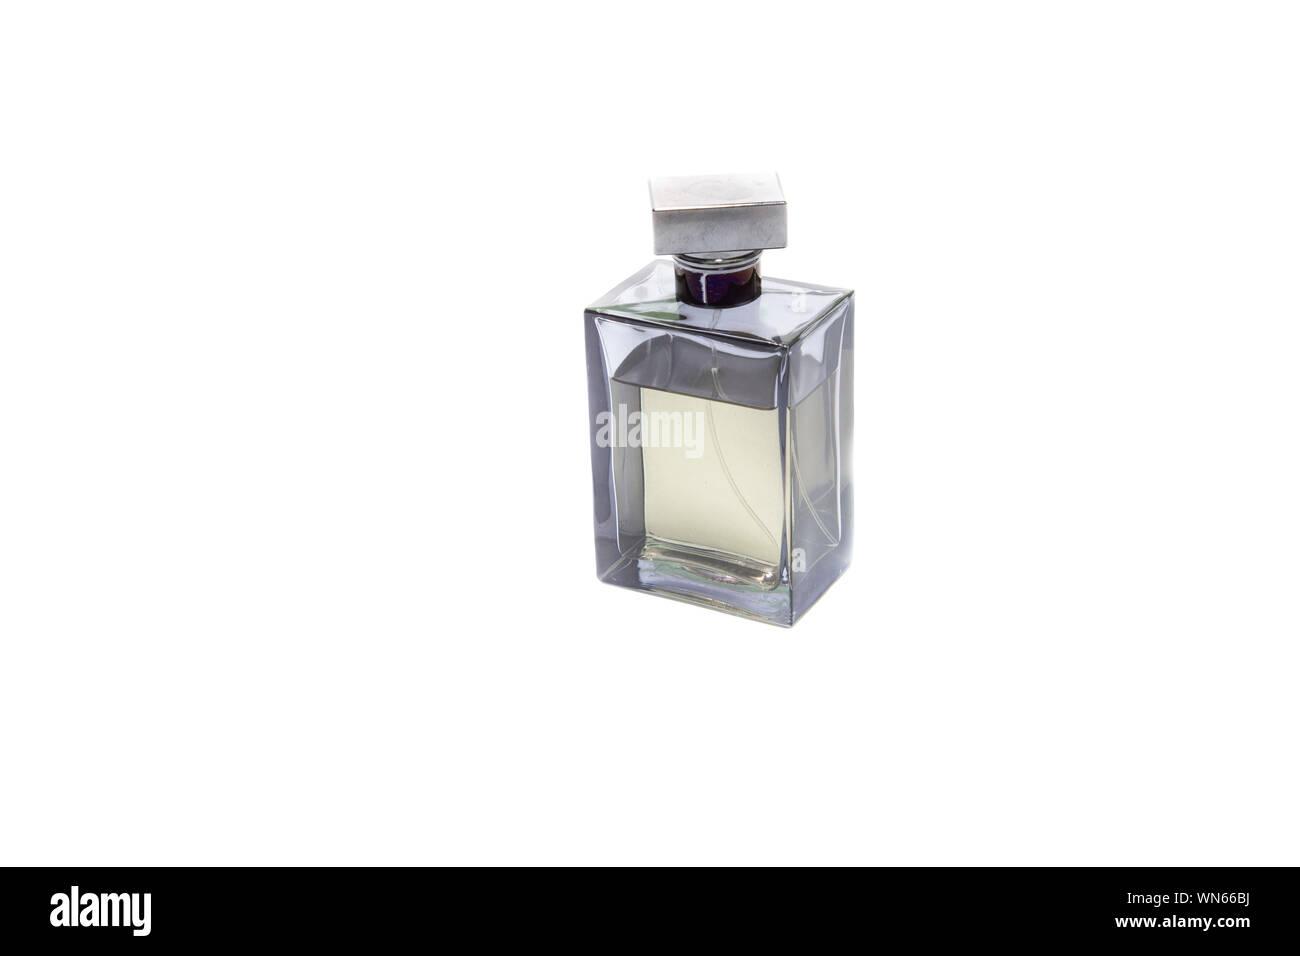 Pulverizador De Perfume Fotos e Imágenes de stock Alamy